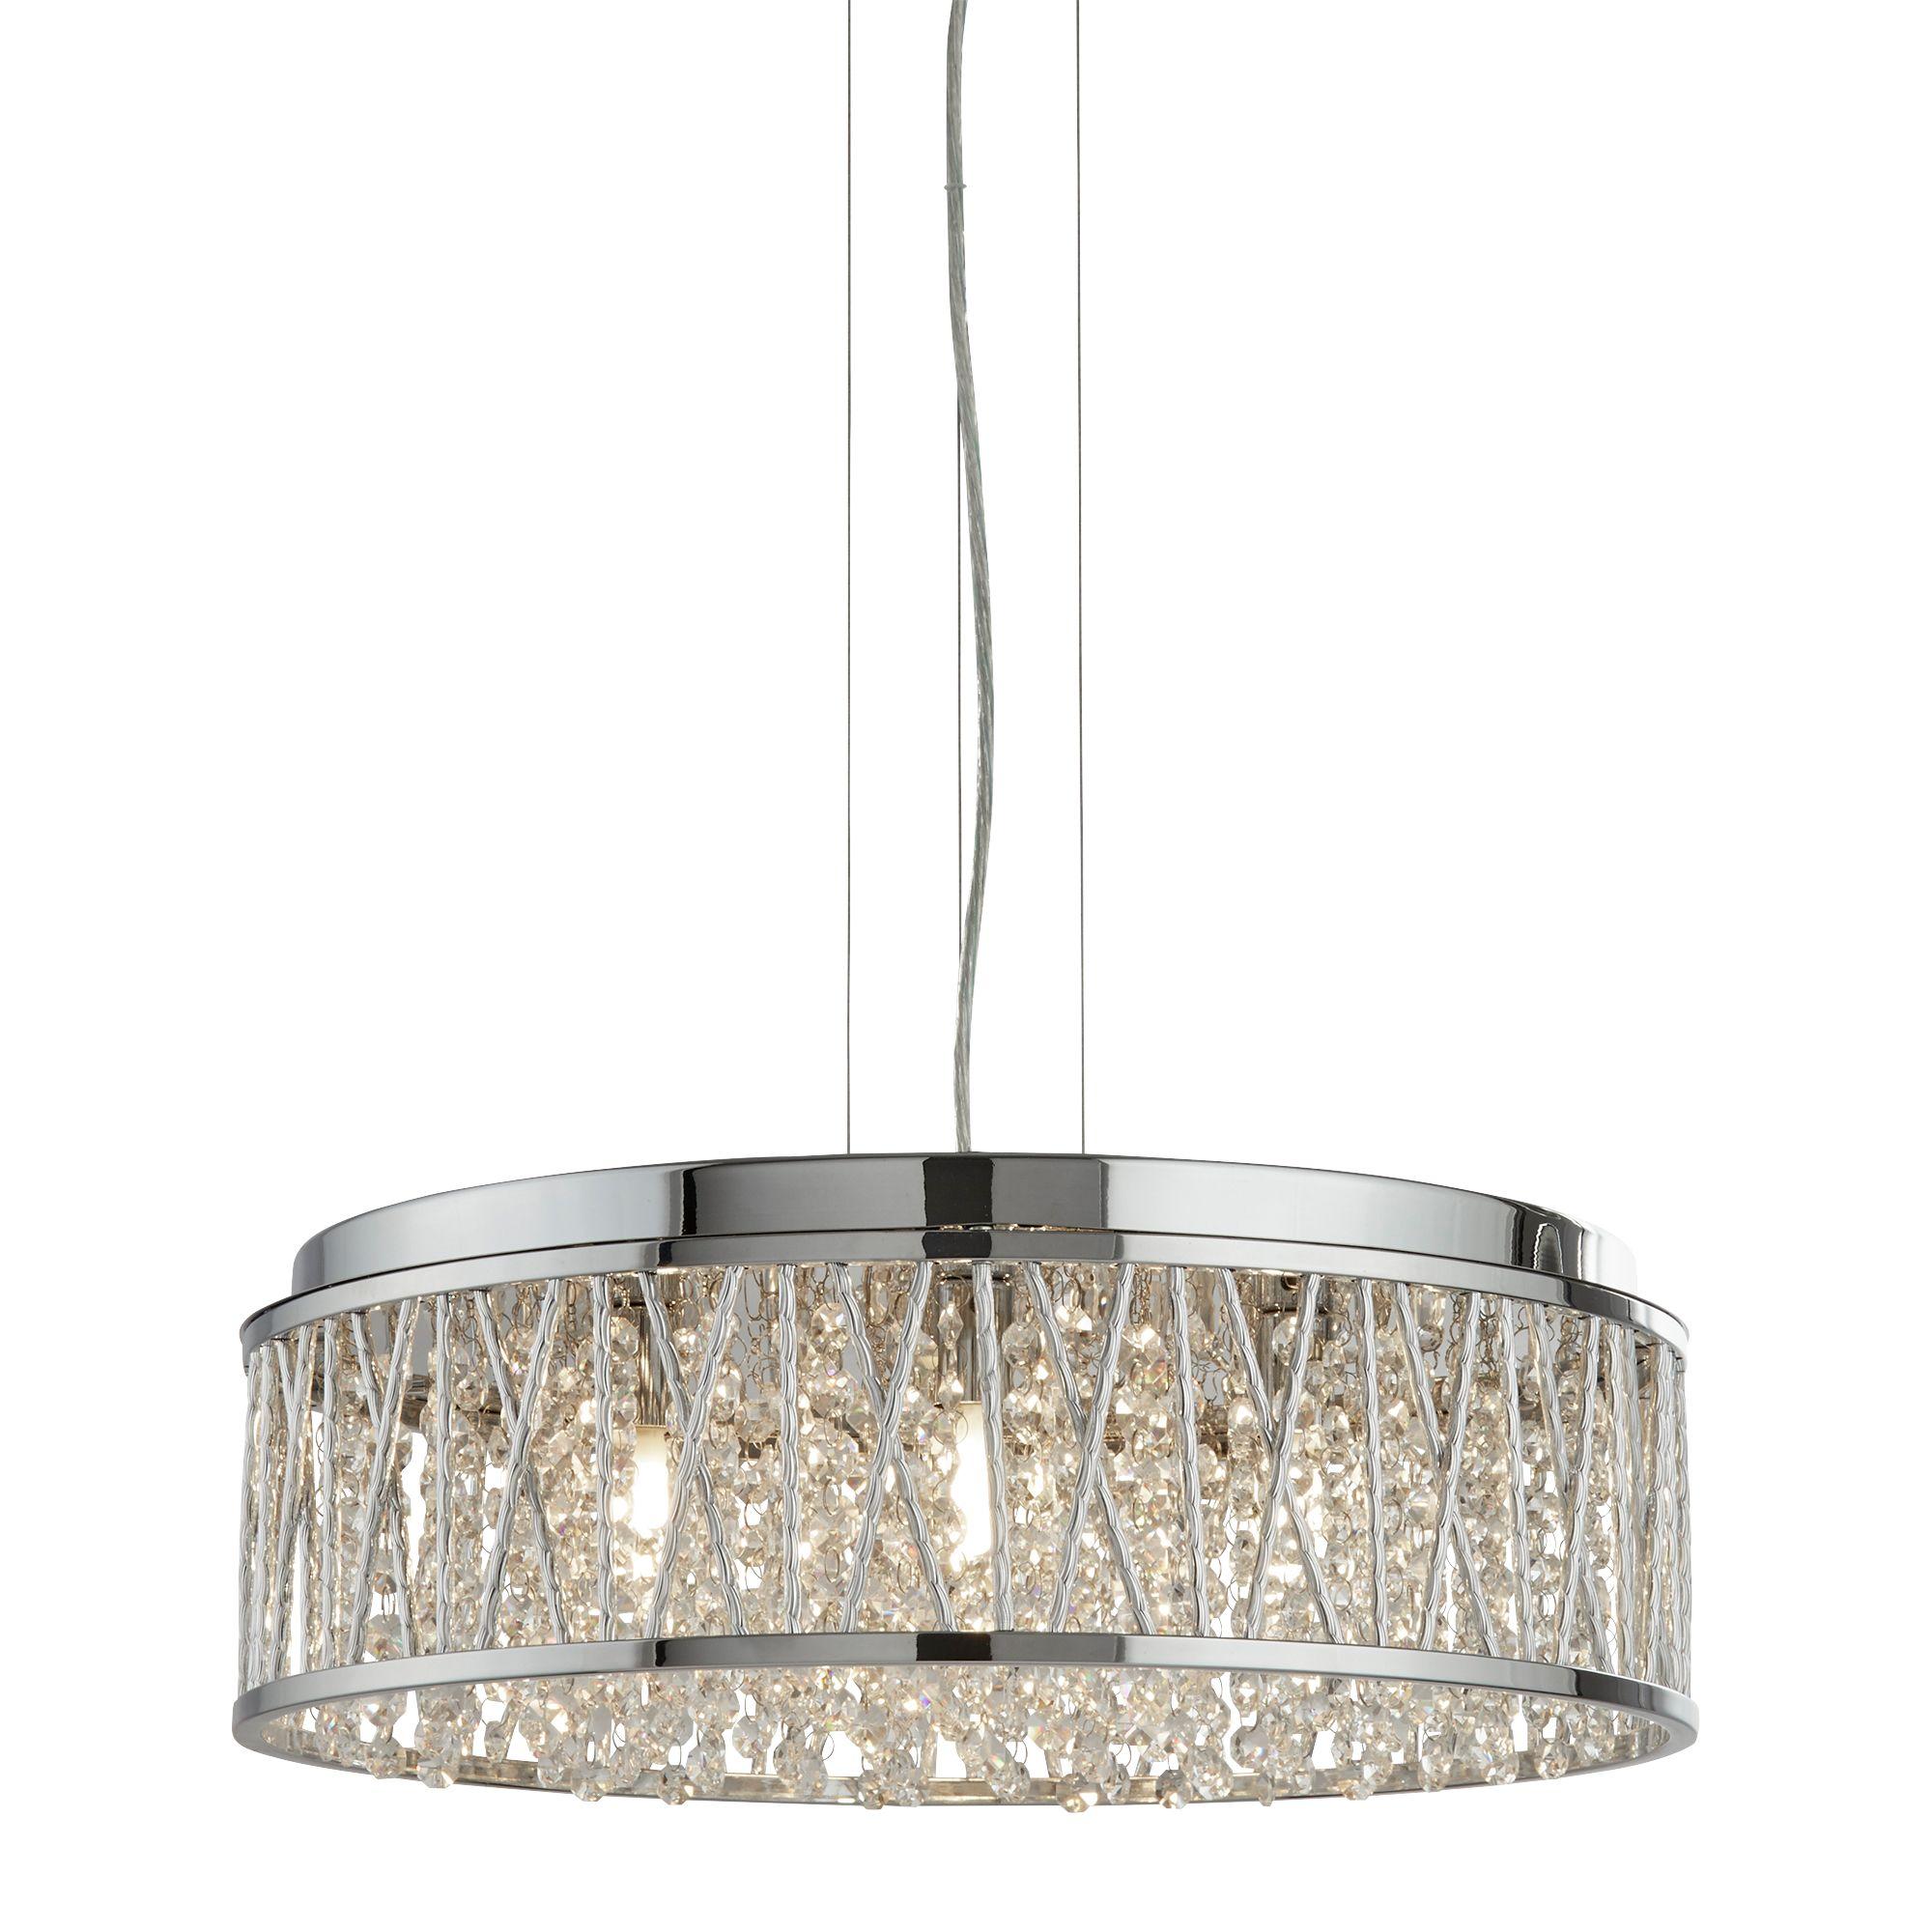 Searchlight Elise kristály lámpa